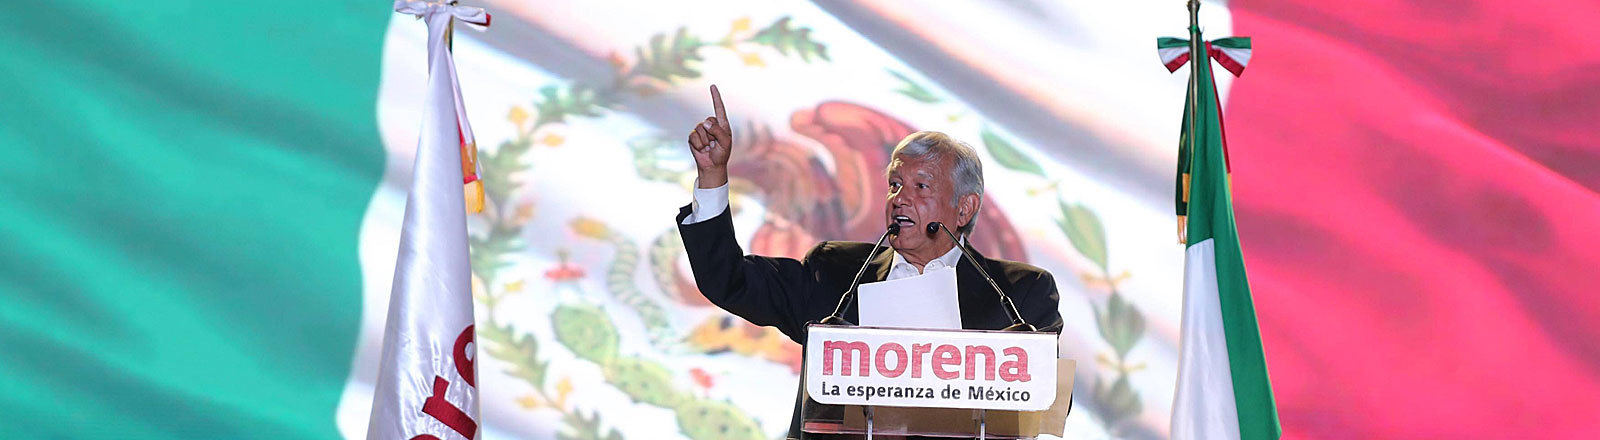 Mexikos Präsidentschaftskandidat Andrés Manuel López Obrador bei einer Wahlkampfveranstaltung am 27.06.2018